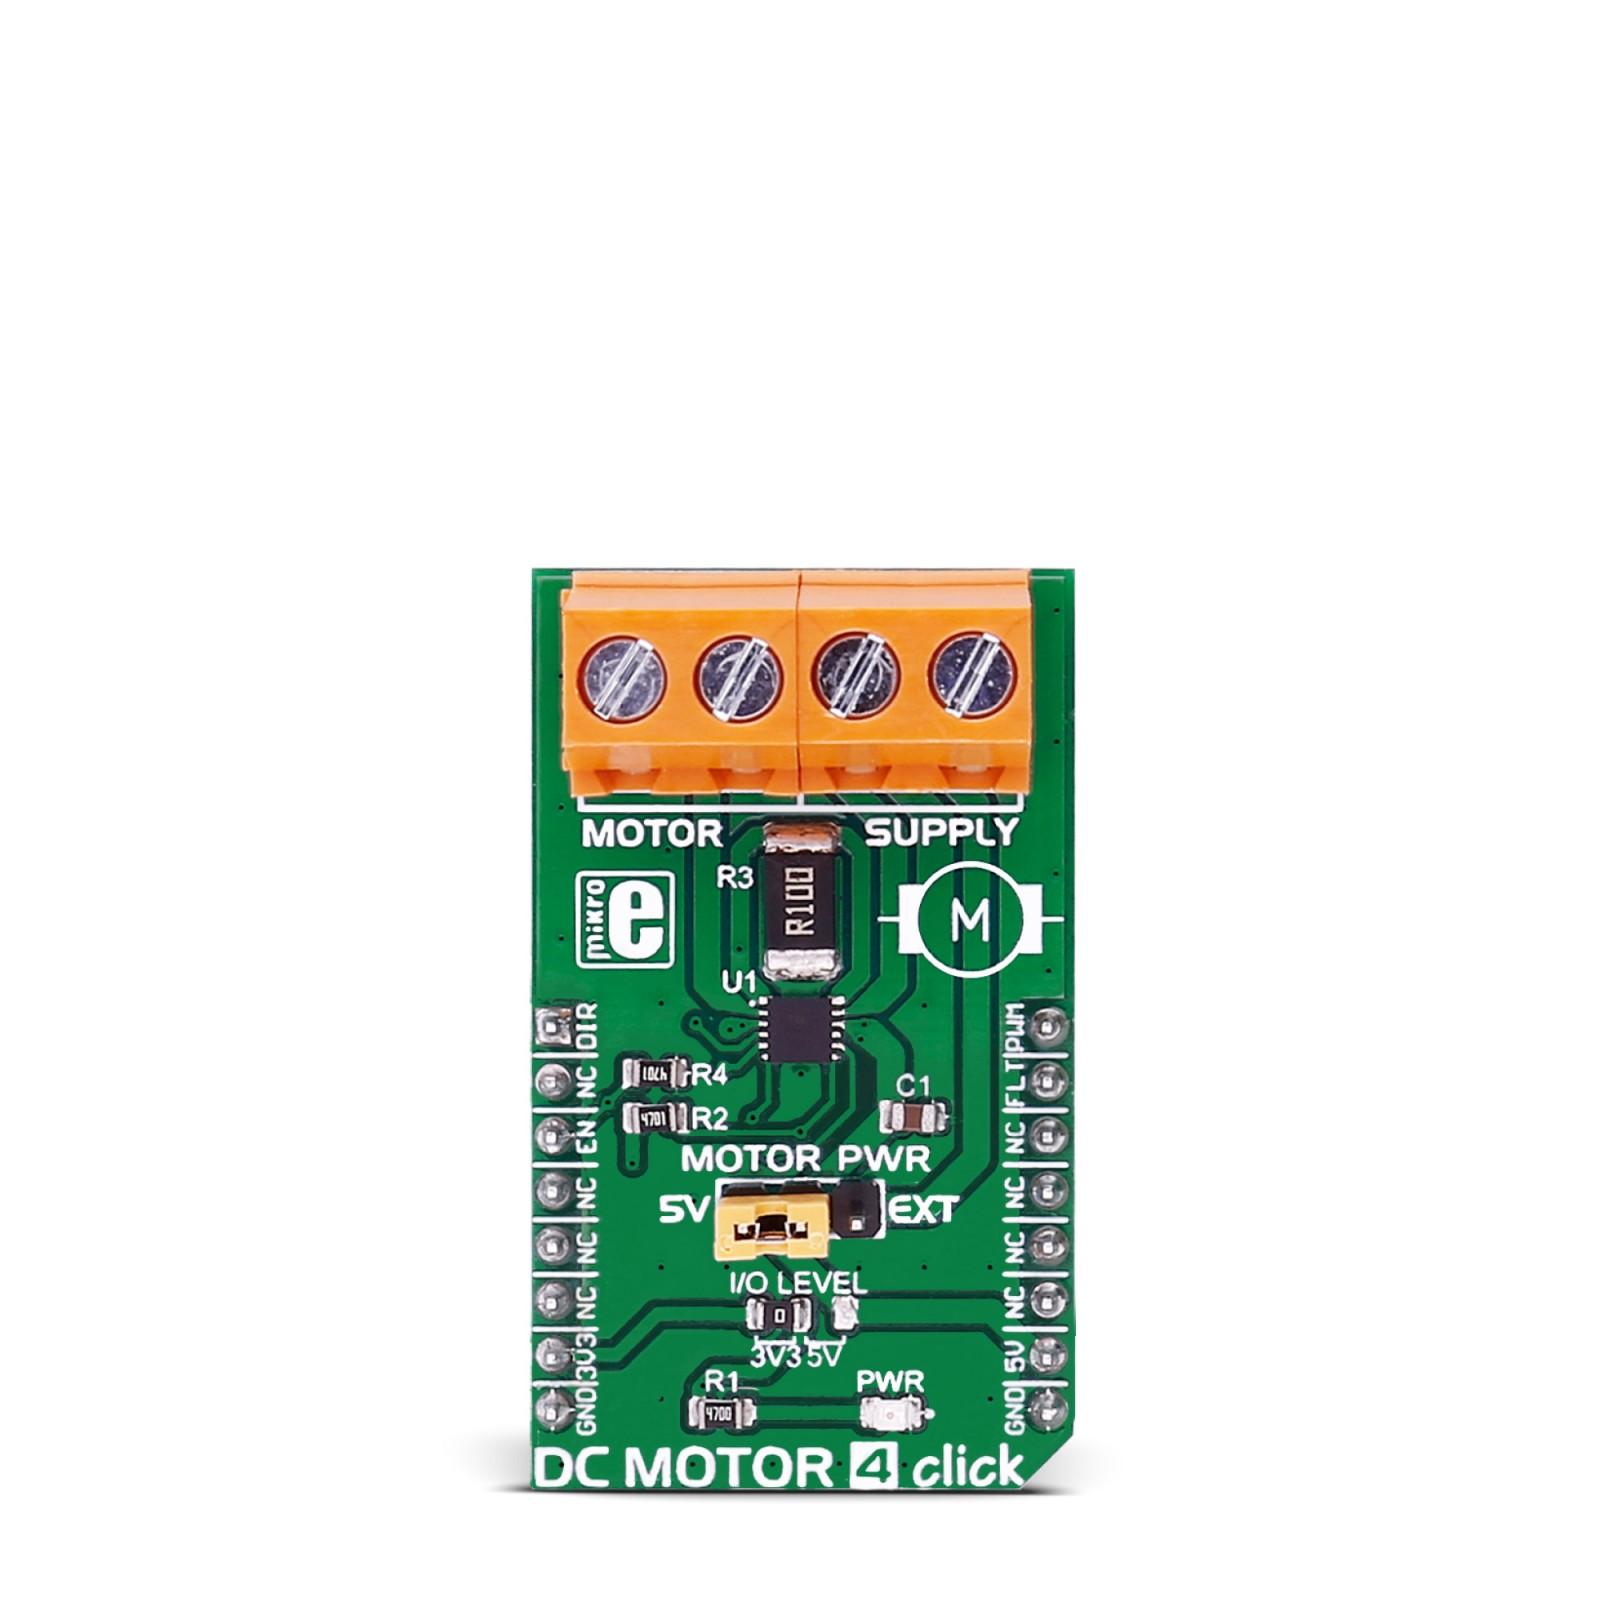 Dc Motor 4 Click Driving Motors Between 45v And 36v Pwm Based Speed Control Using Microcontroller Circuit Diagram Mgctlbxnmzp Mgctlbxv5112 Mgctlbxlc Mgctlbxpprestashop